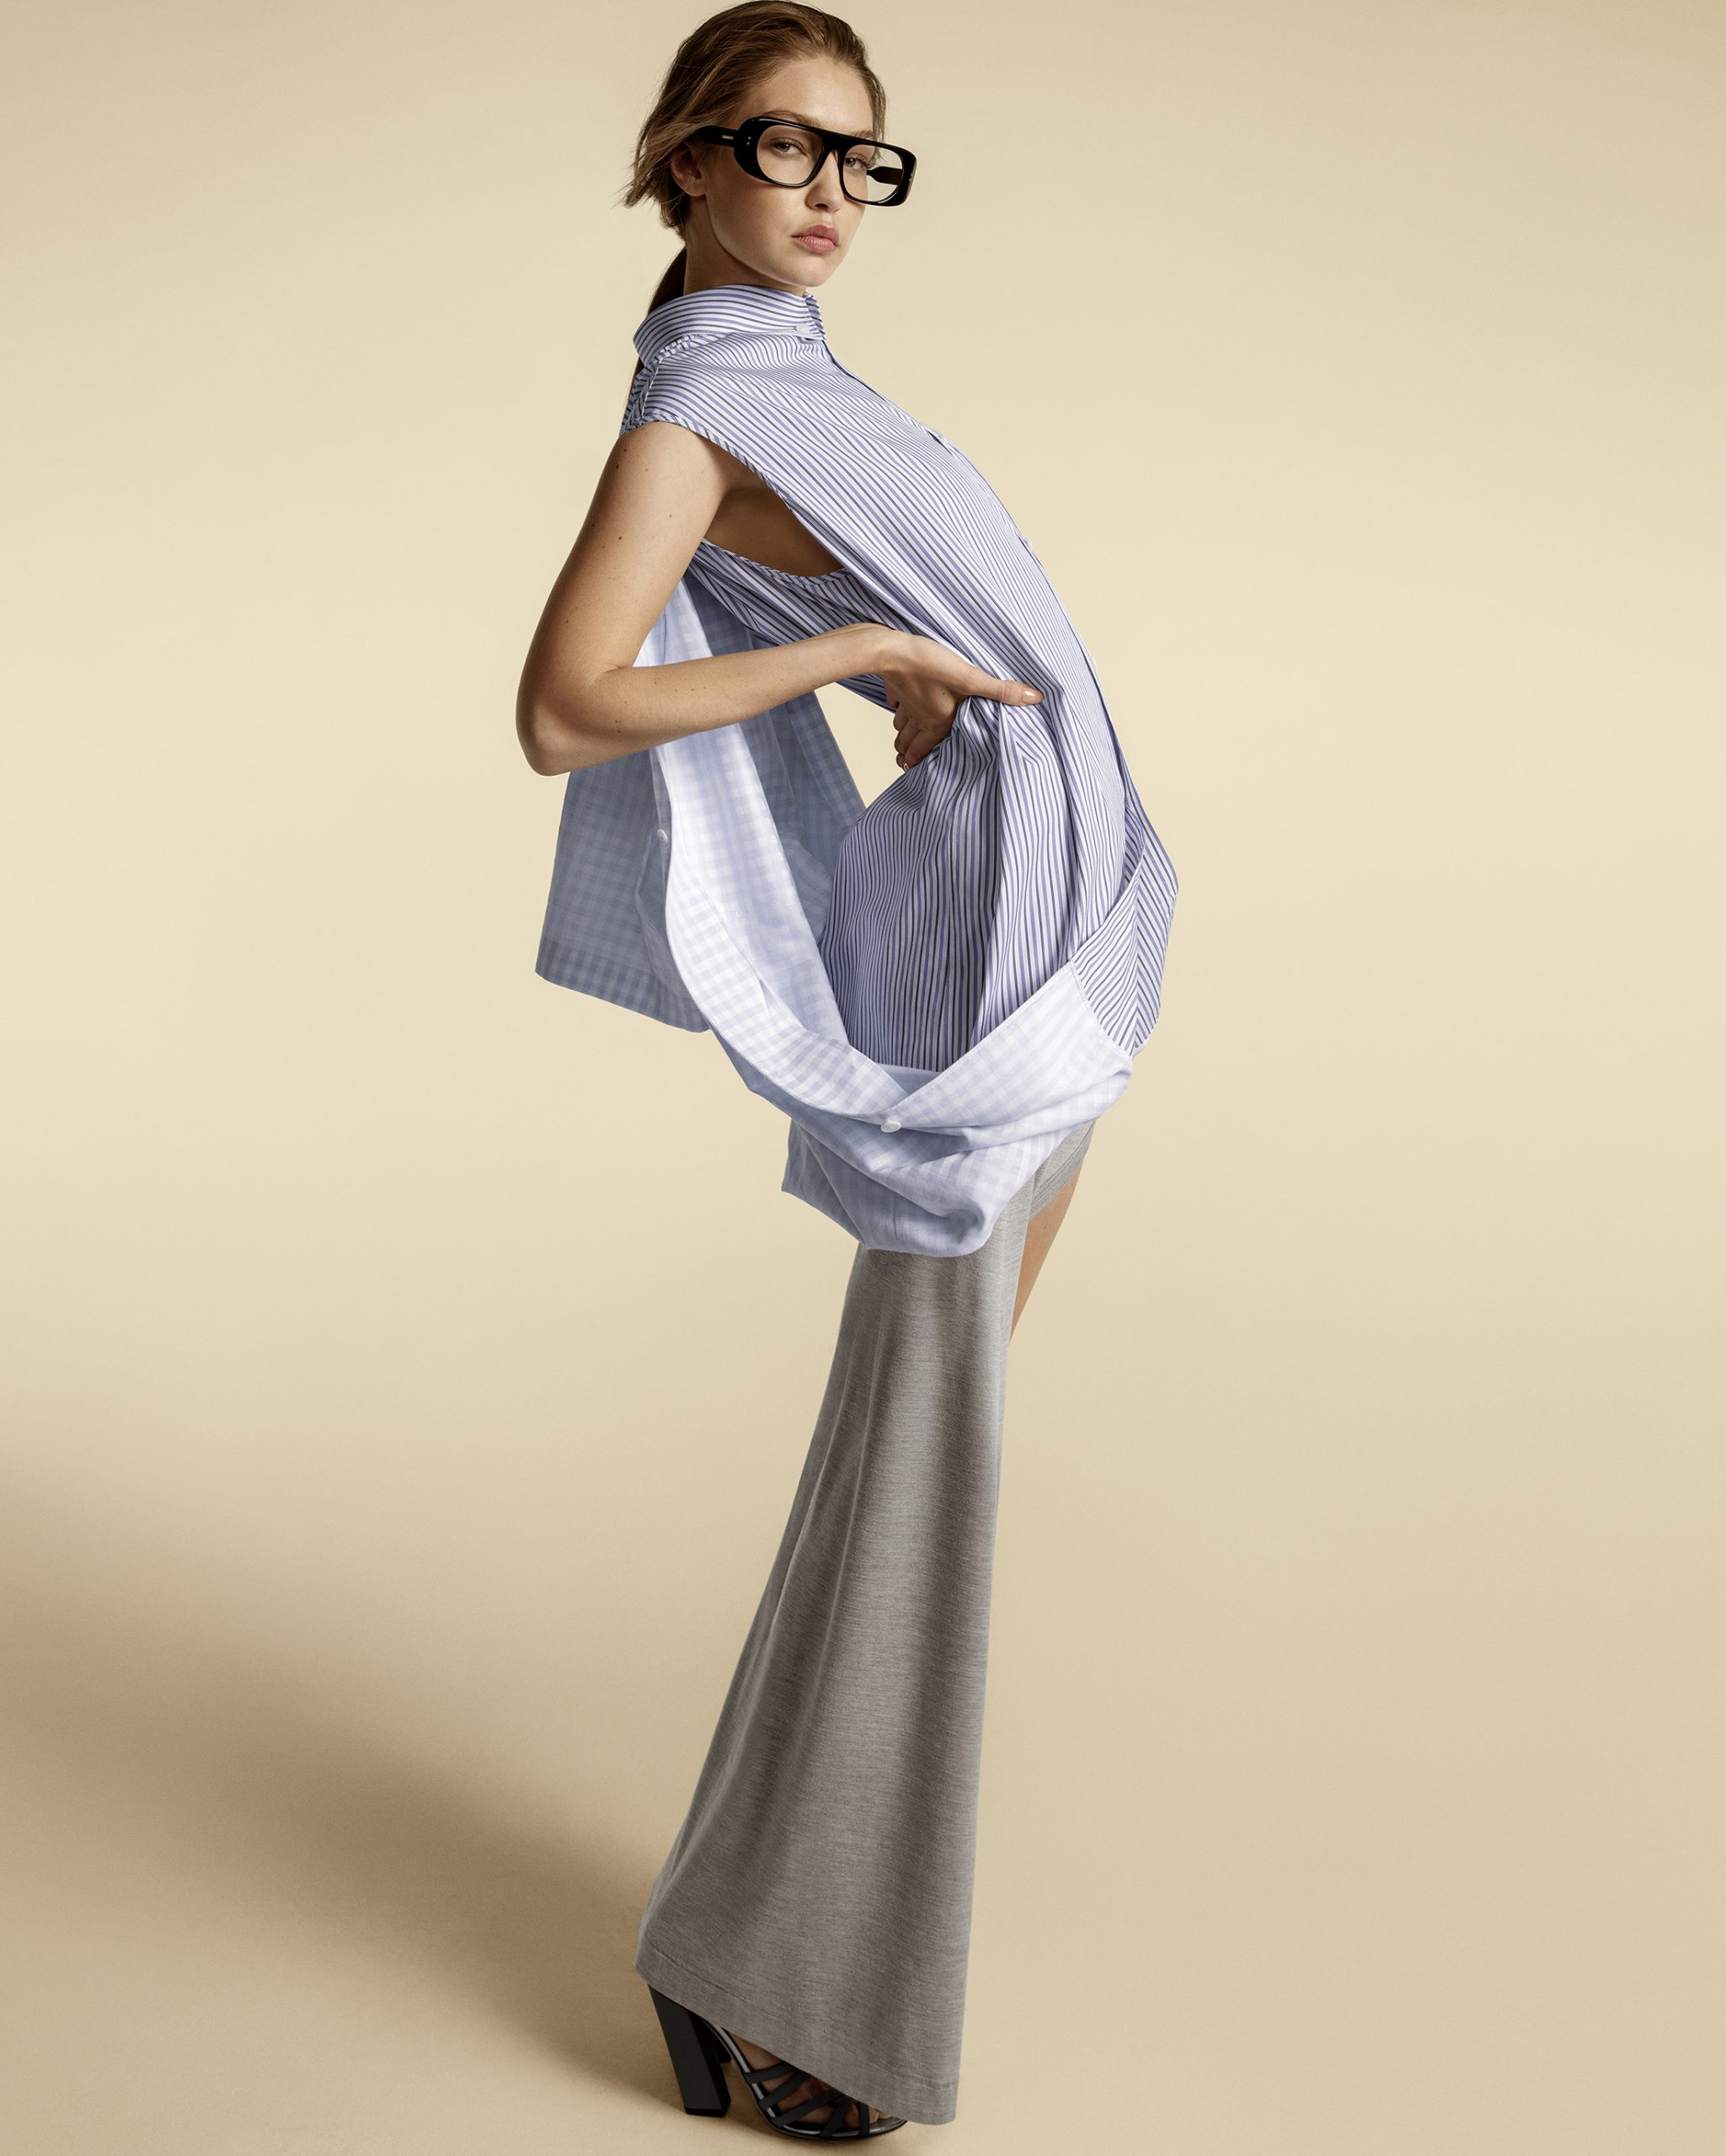 Burberry Spring 2020 Fashion Ad Campaign Photos